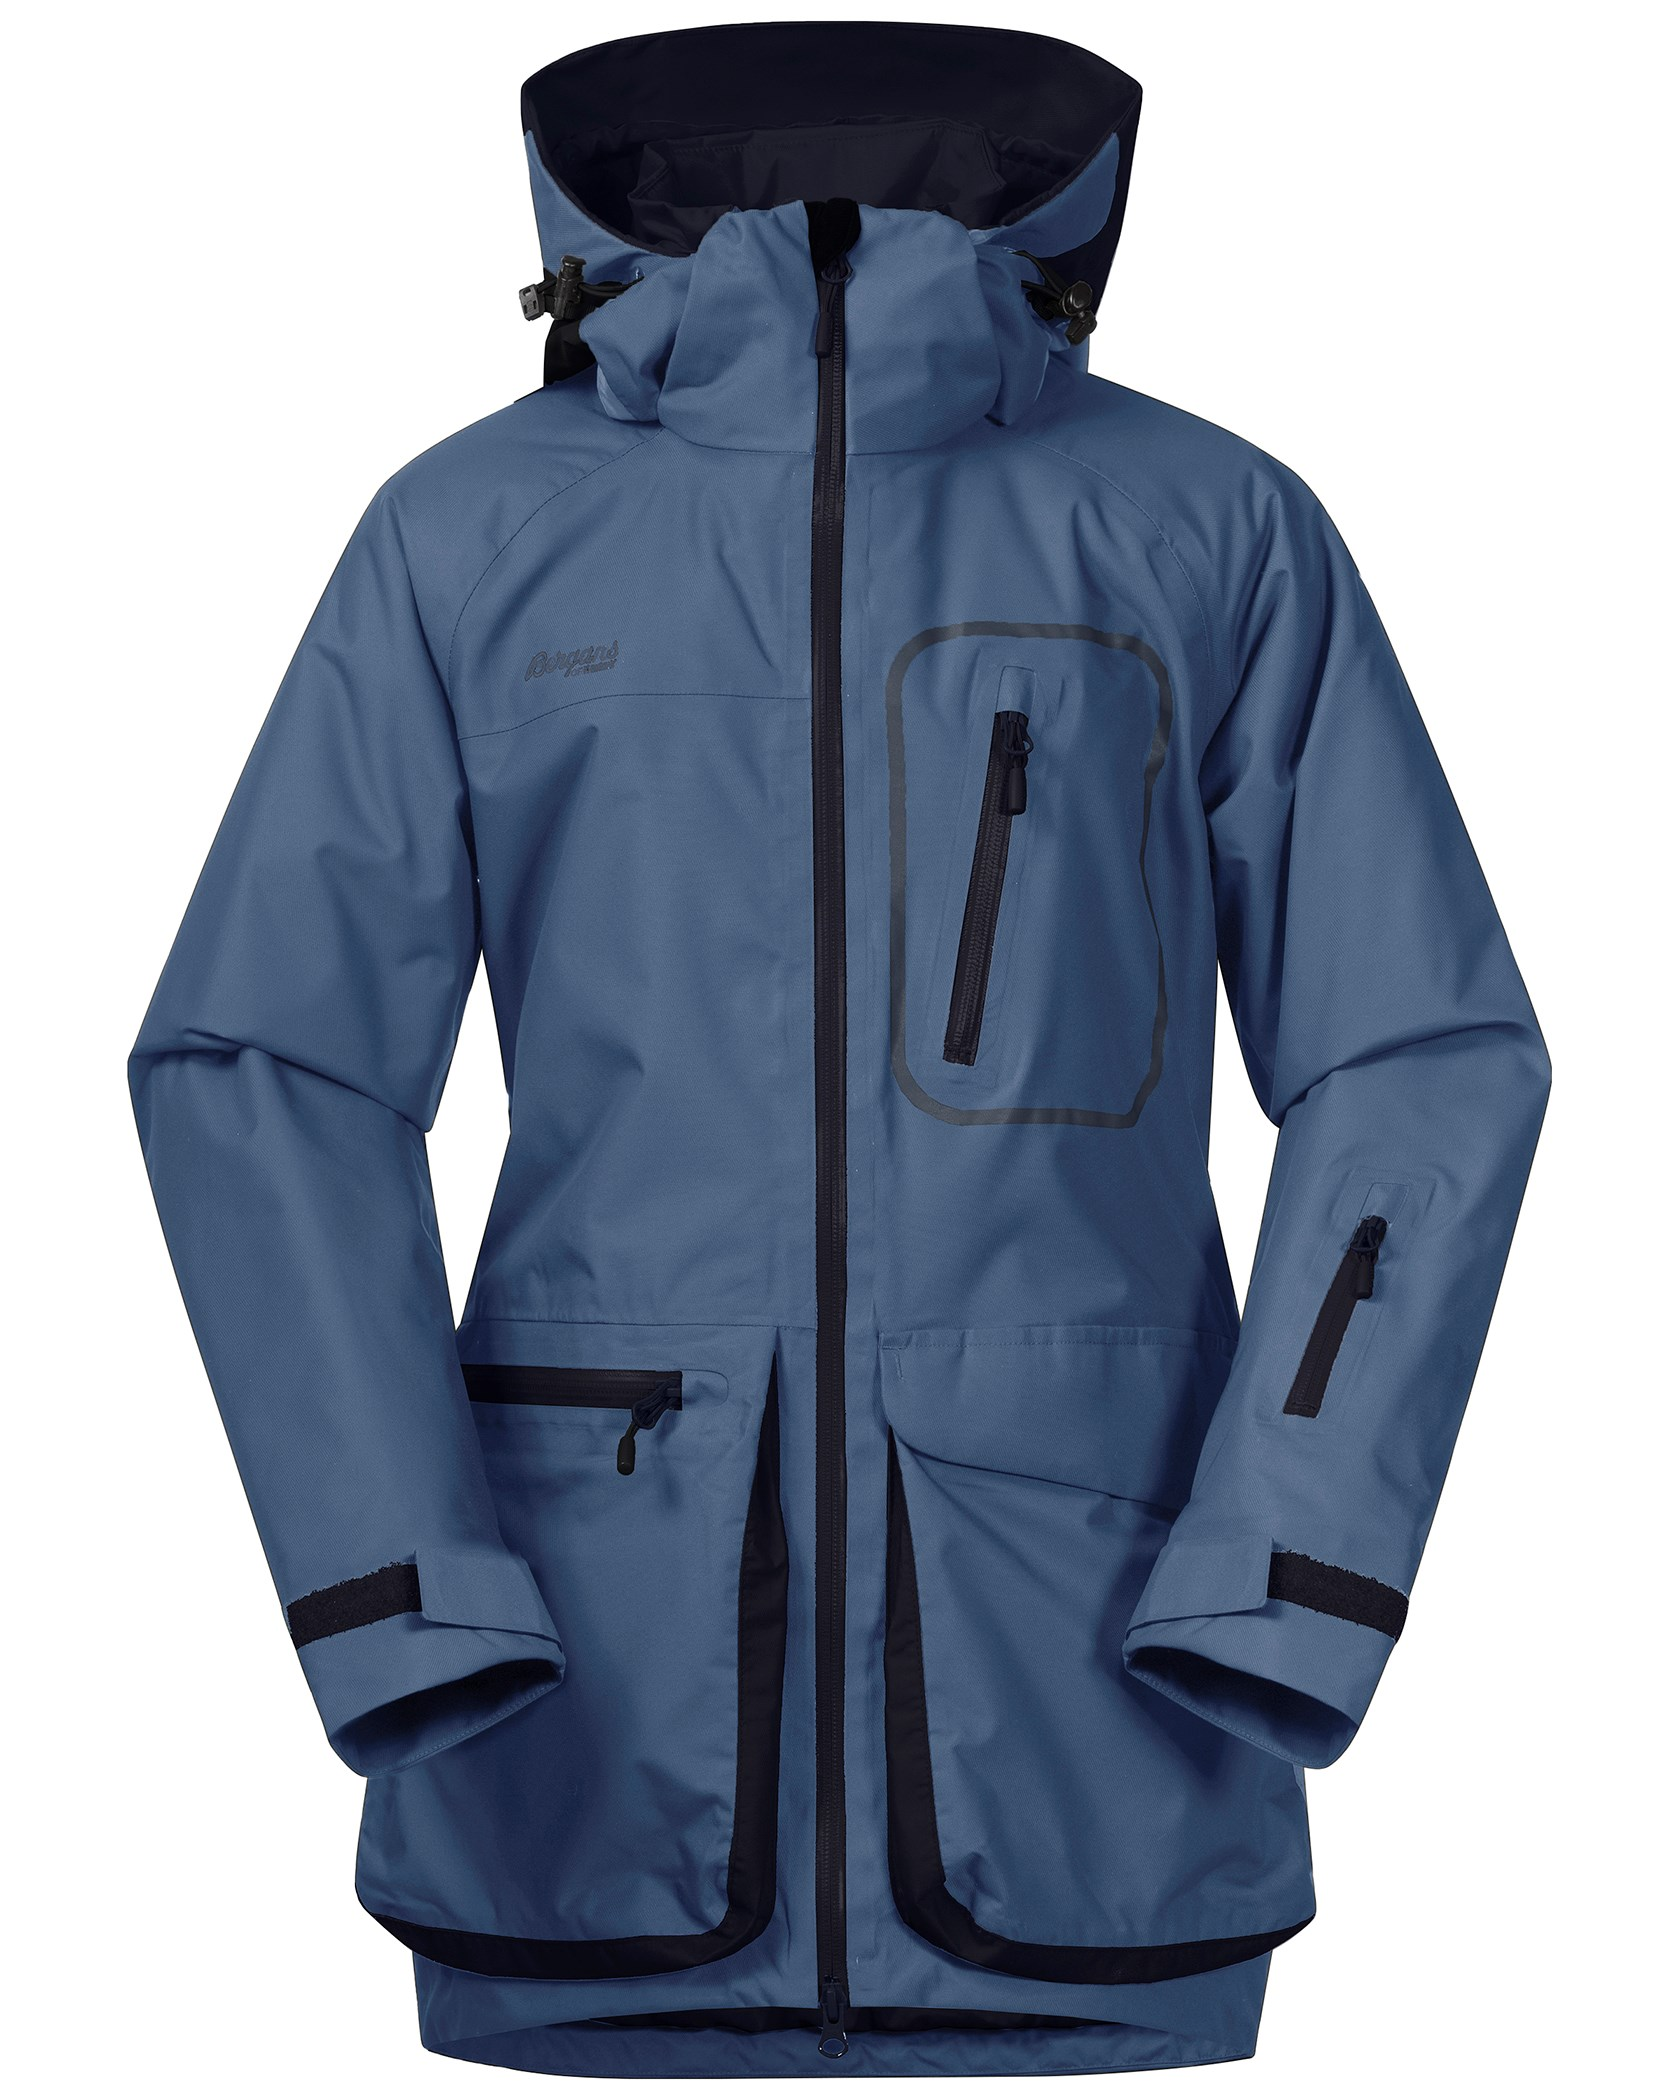 36b993d0f Knyken Insulated Youth Jacket Fogblue/Dk Navy